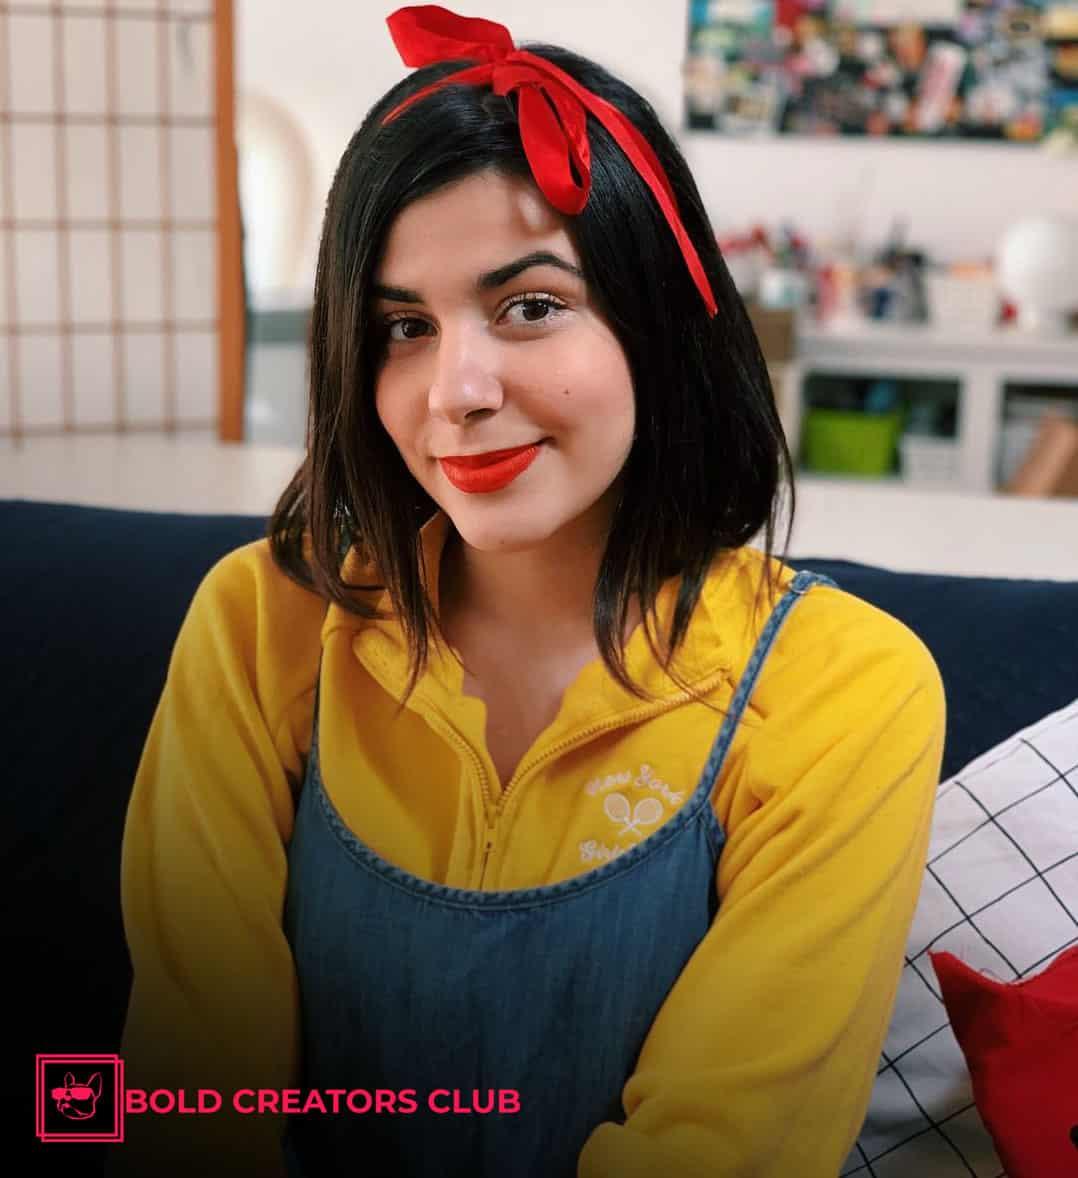 Alicereja Bold Creators Club Influencer Marketing Agency South America Brazil